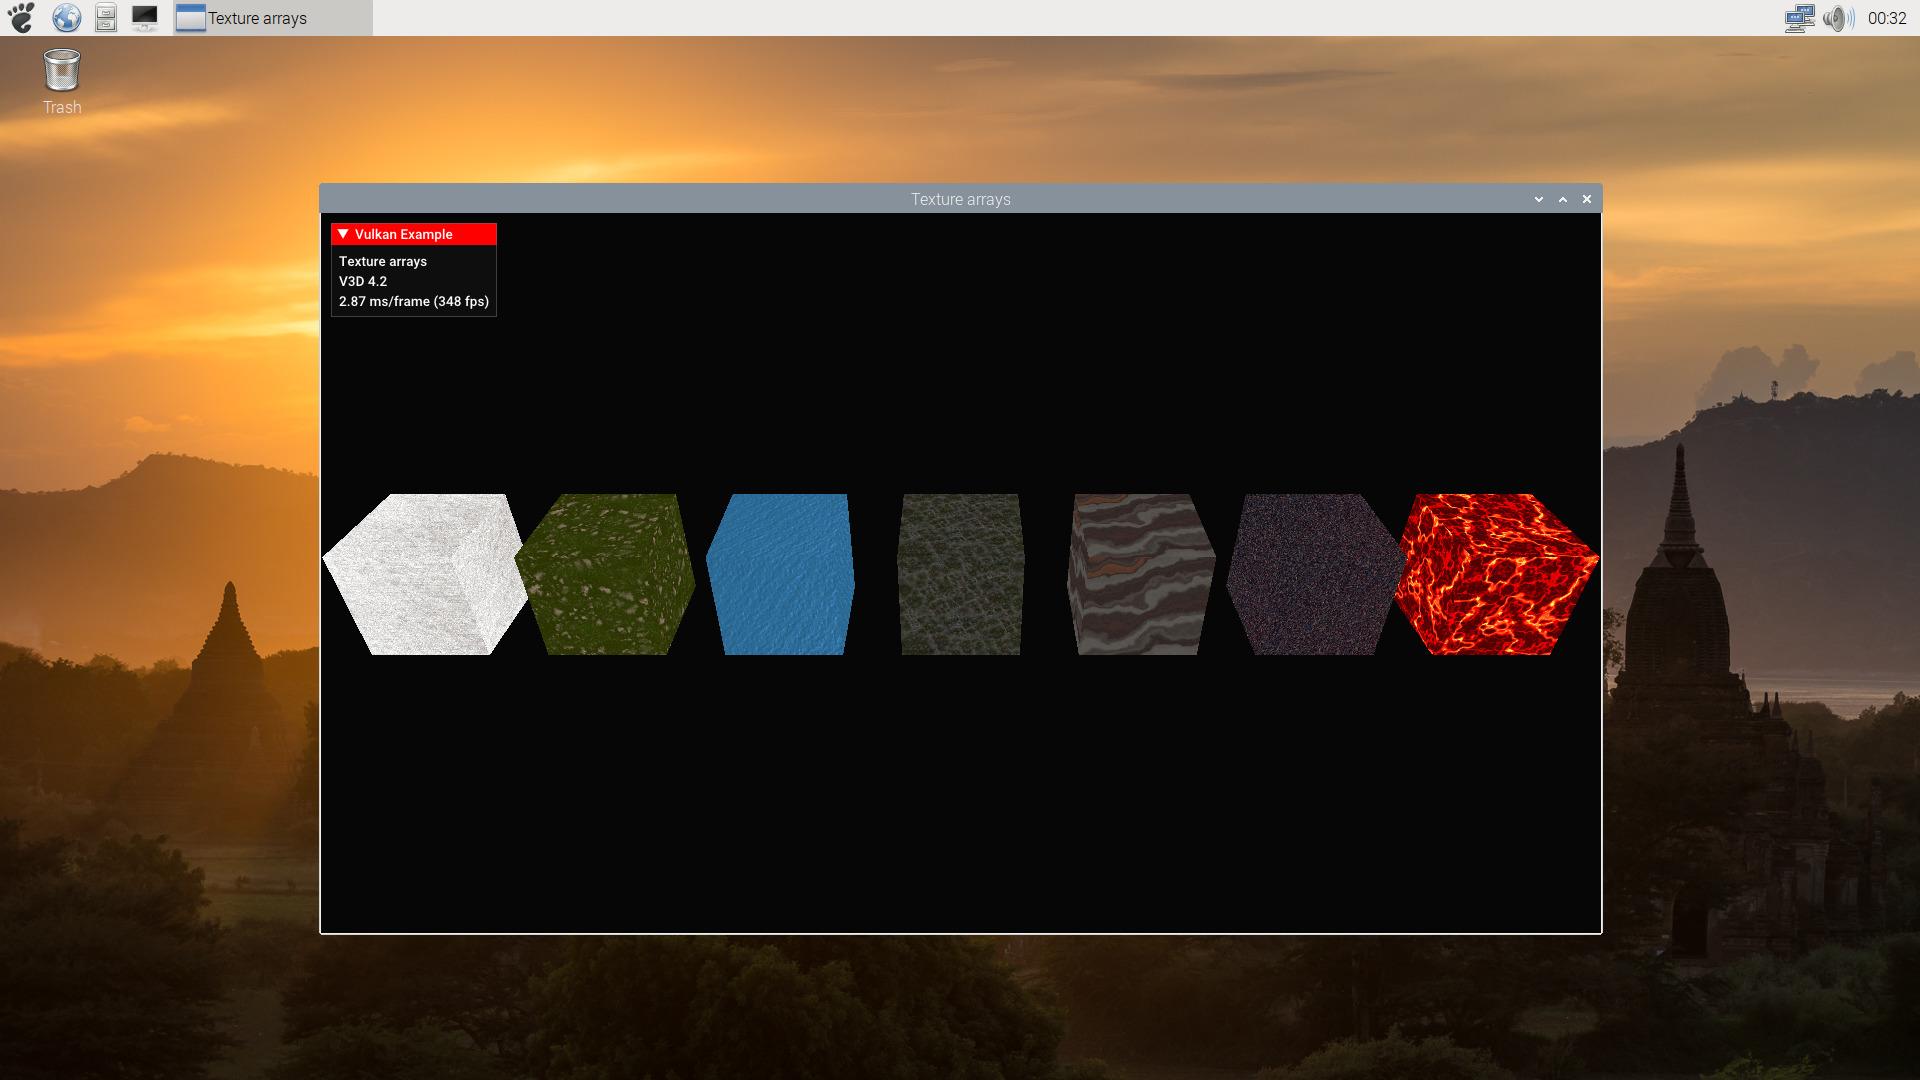 Sascha Willems texture array demo run on rpi4